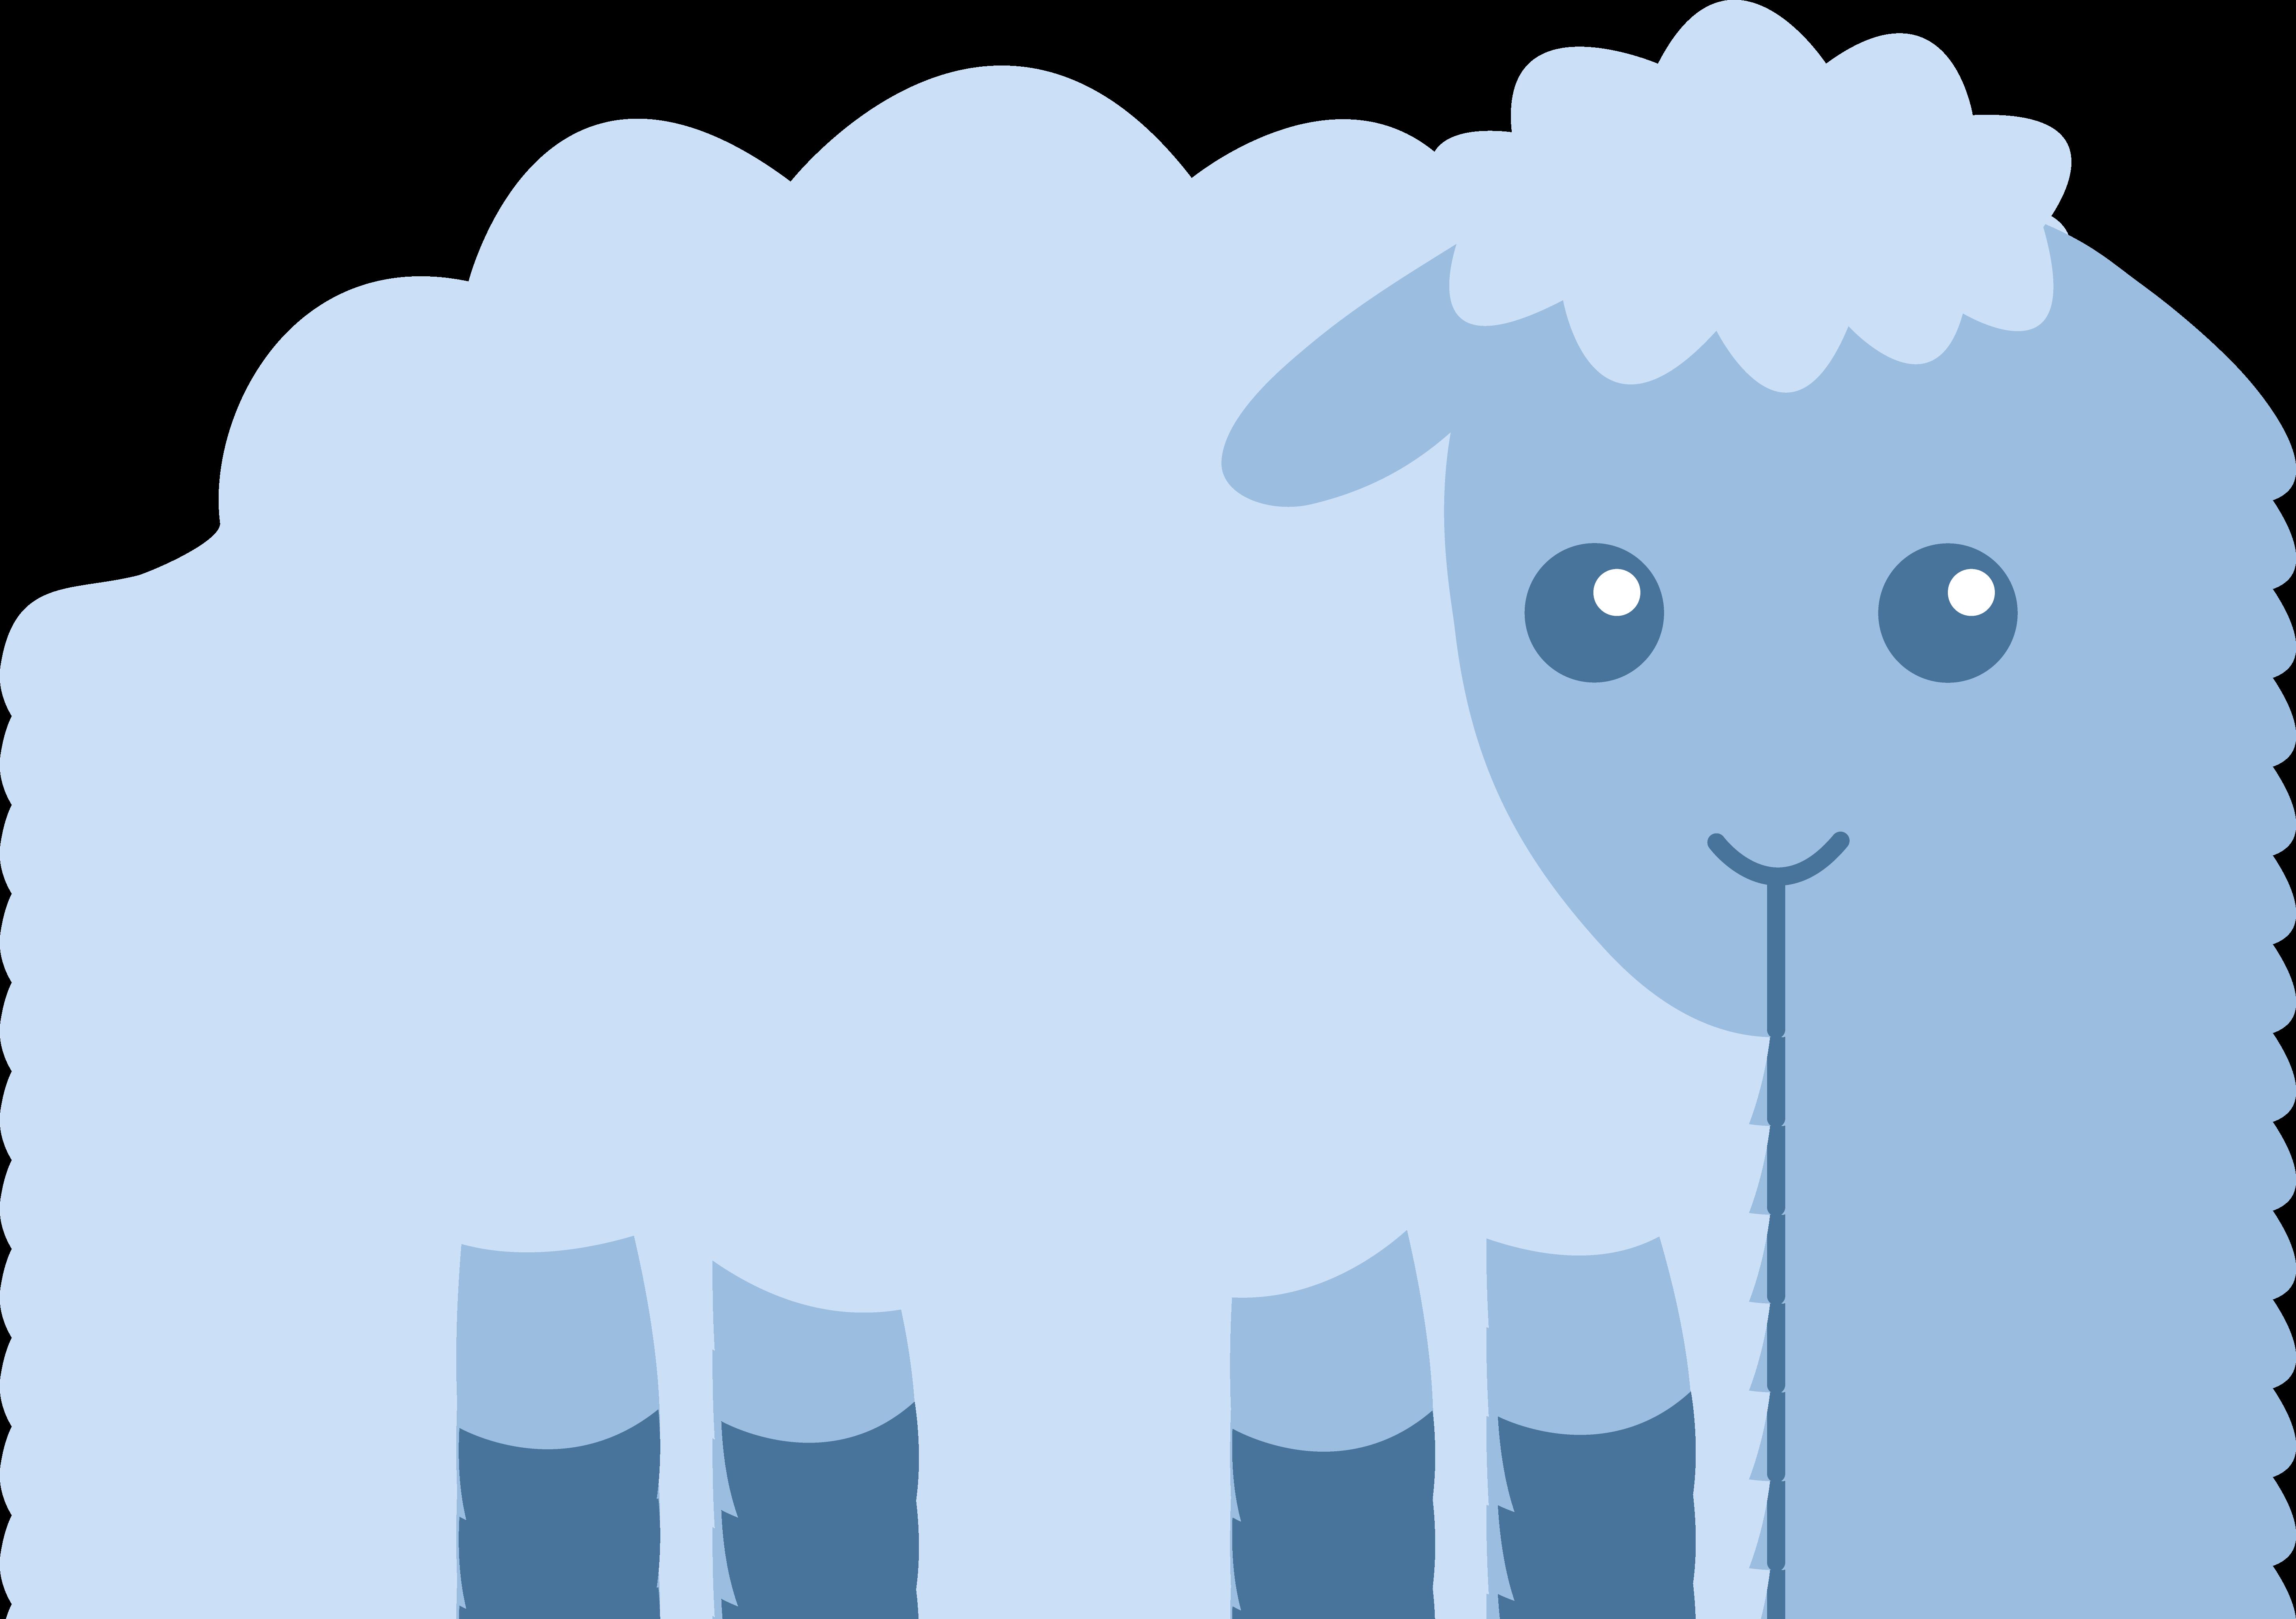 Cute at getdrawings com. Eyes clipart sheep